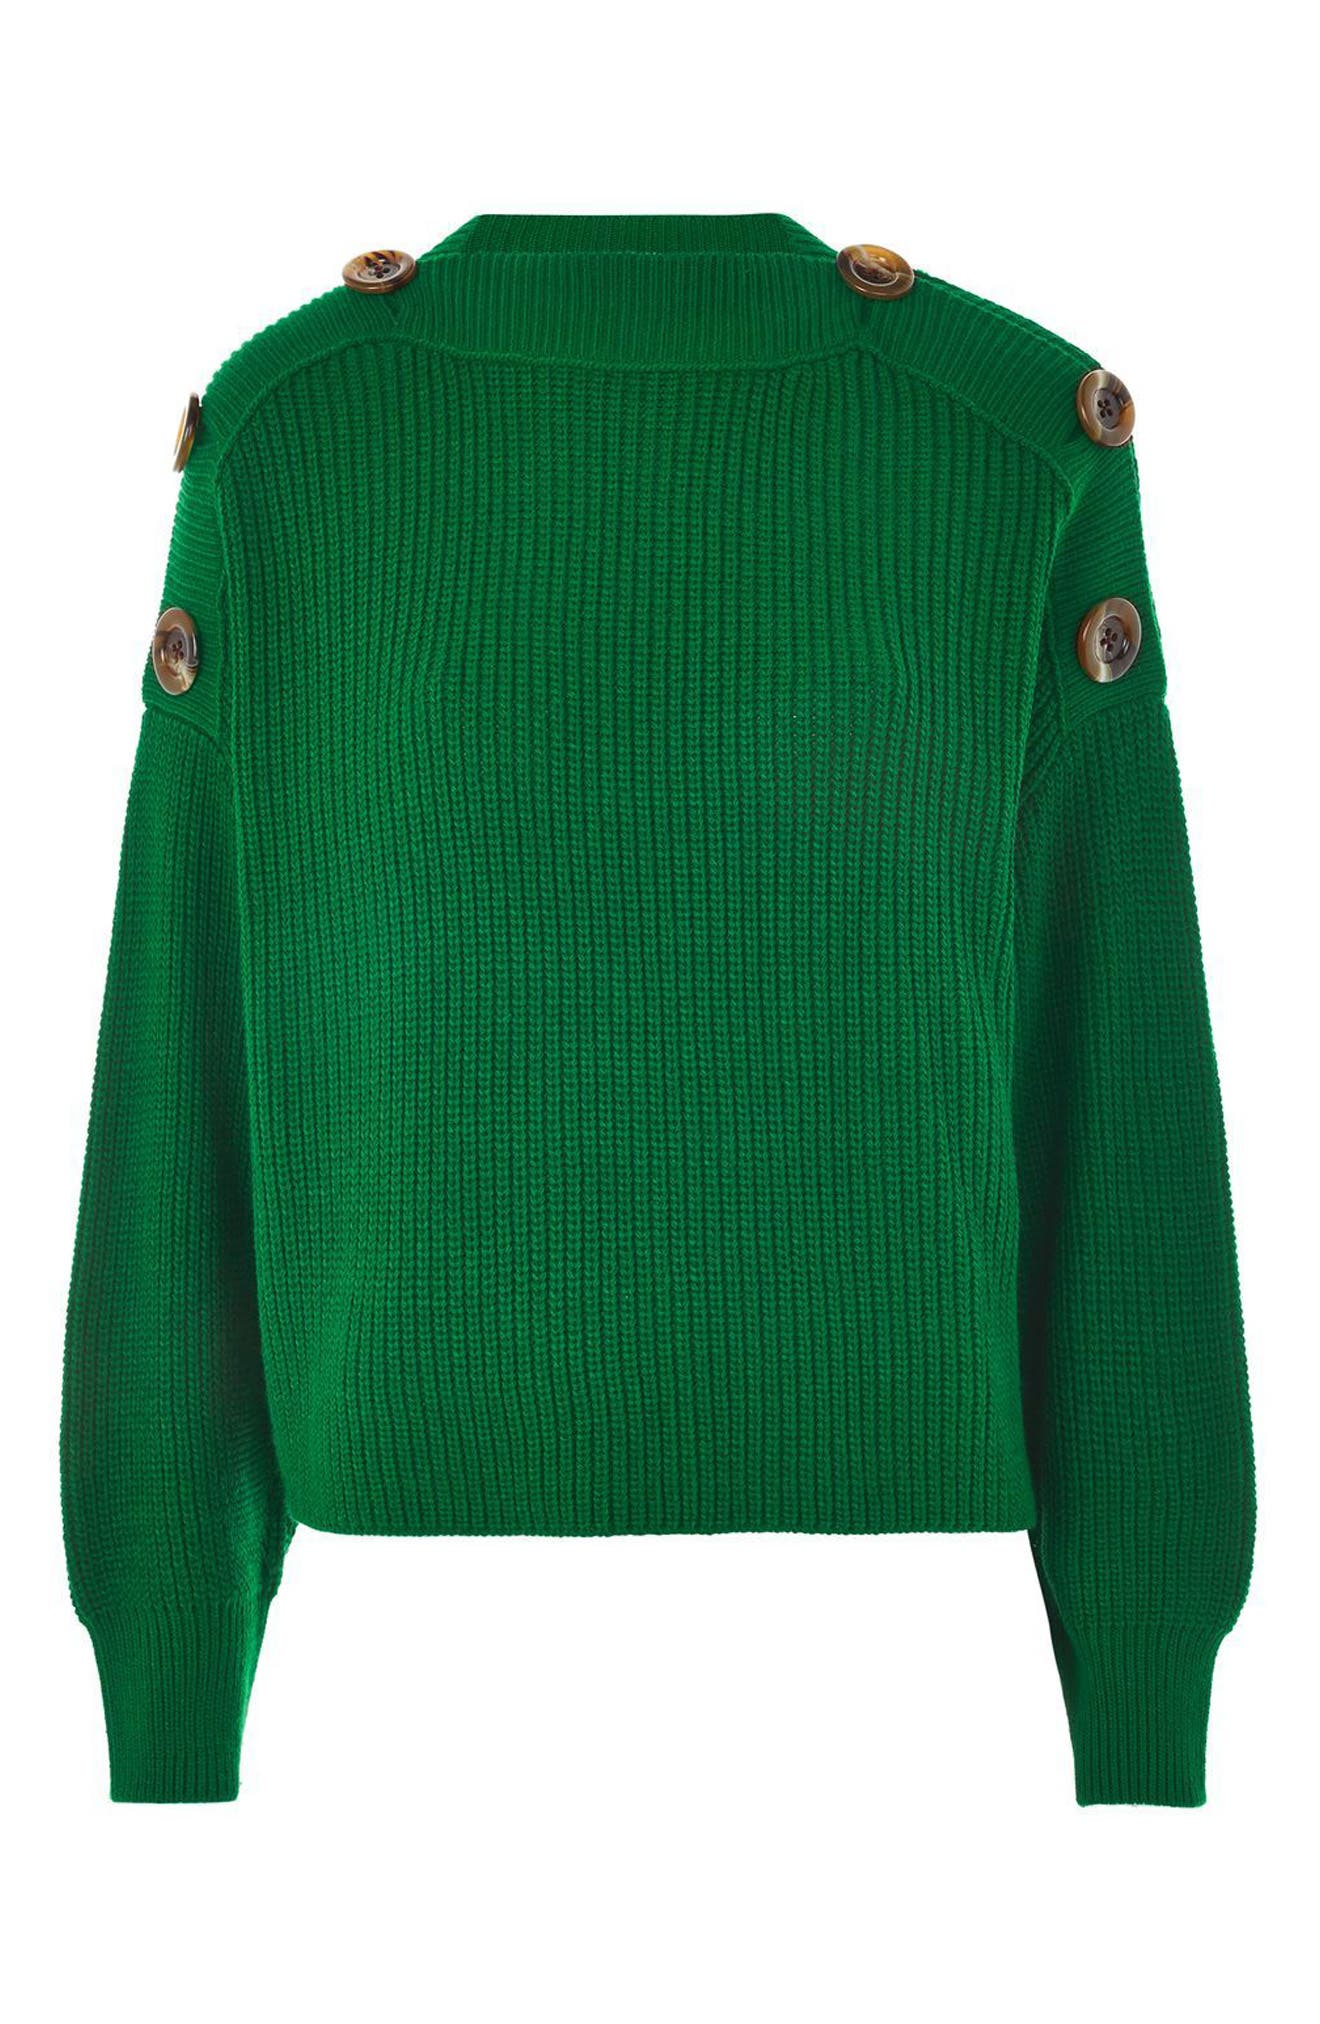 Button Slash Knit Sweater,                             Alternate thumbnail 4, color,                             Green